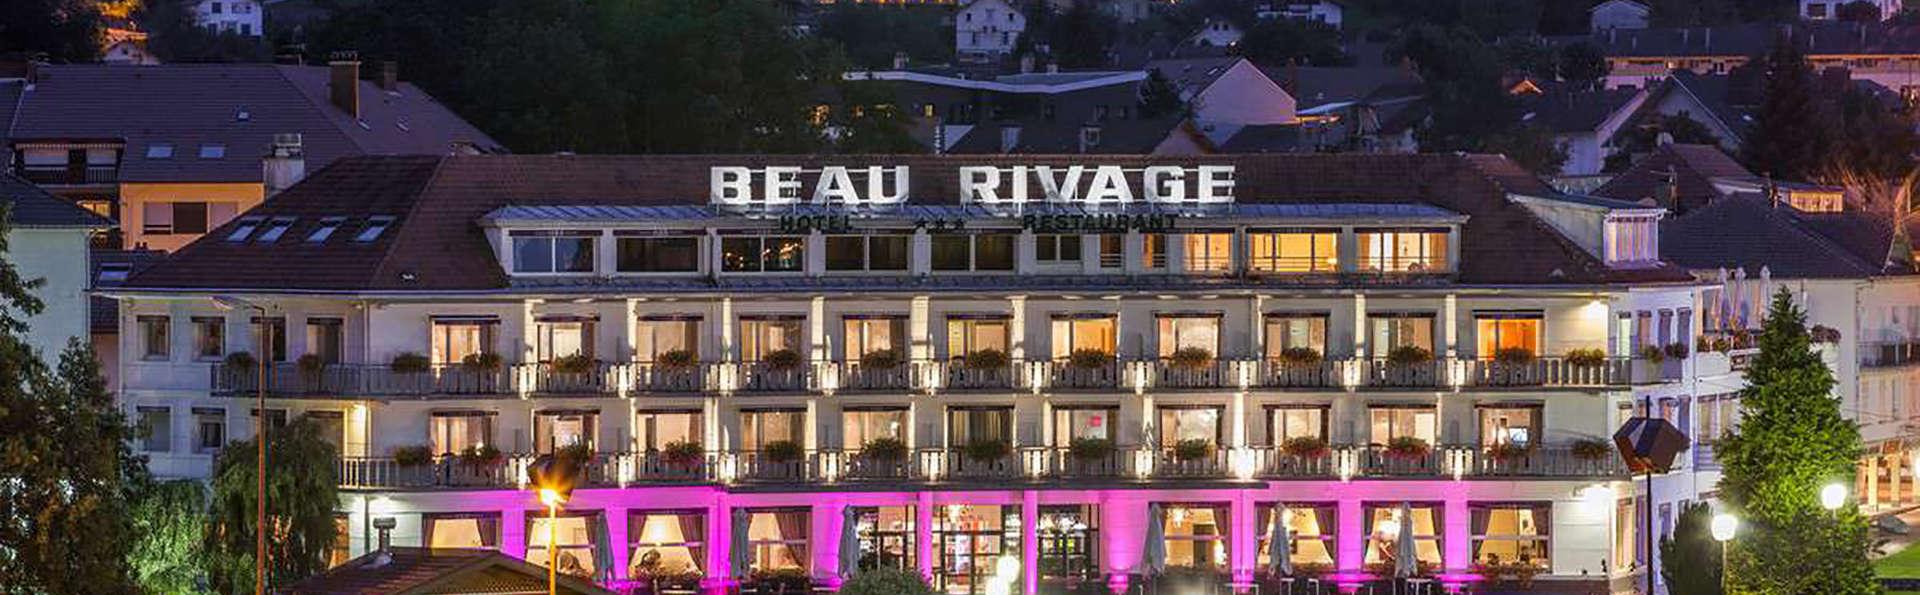 Hôtel Beau Rivage - edit_front.jpg